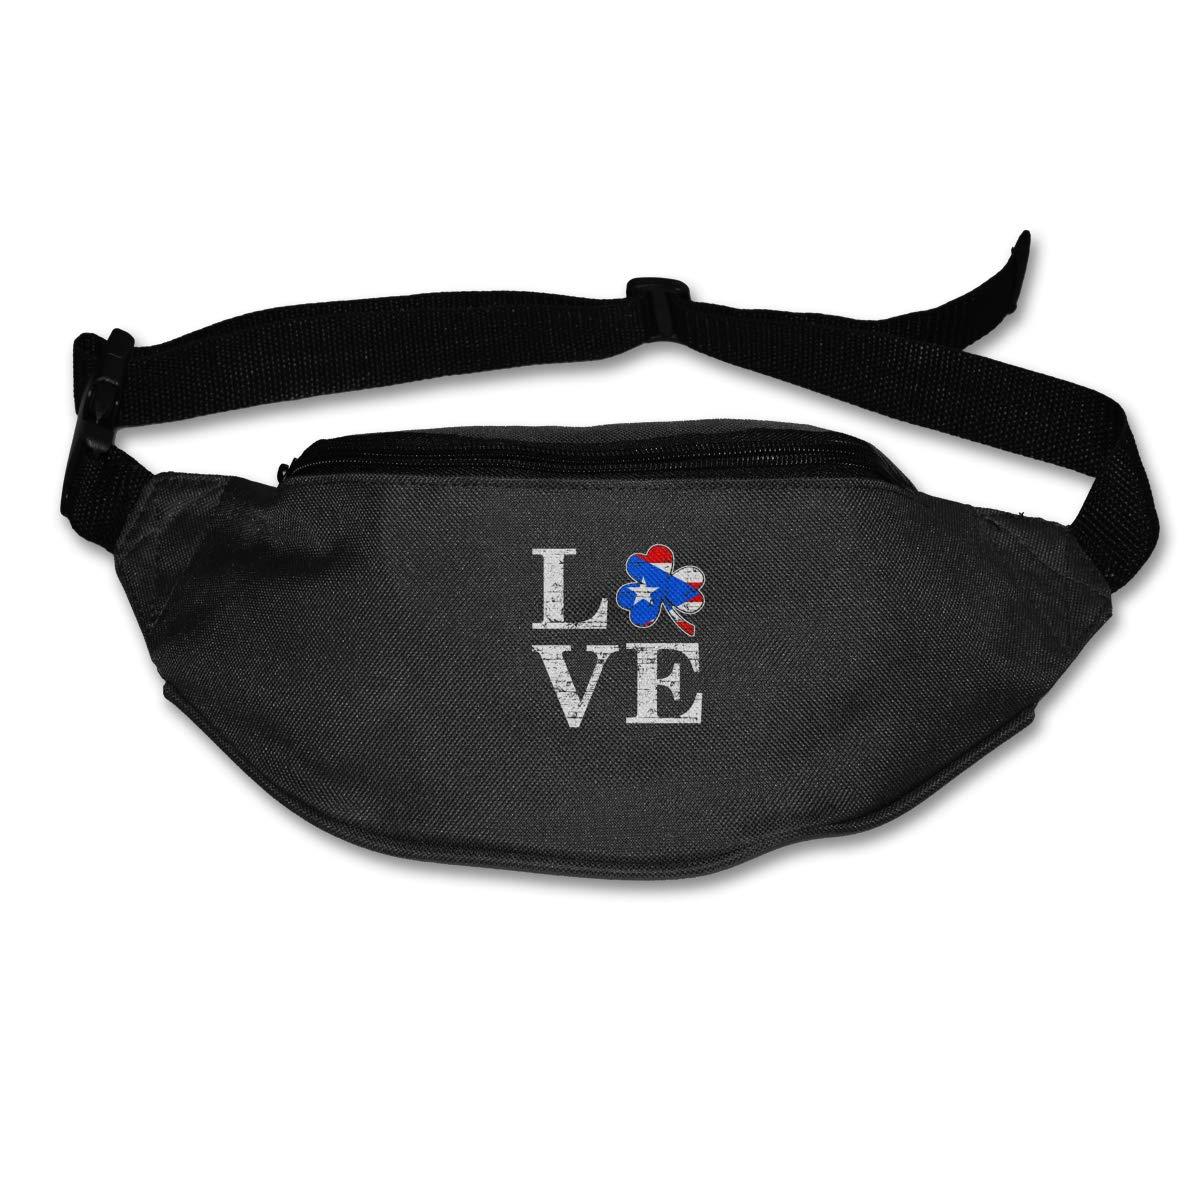 Love Puerto Rico Flag Sport Waist Bag Fanny Pack Adjustable For Travel